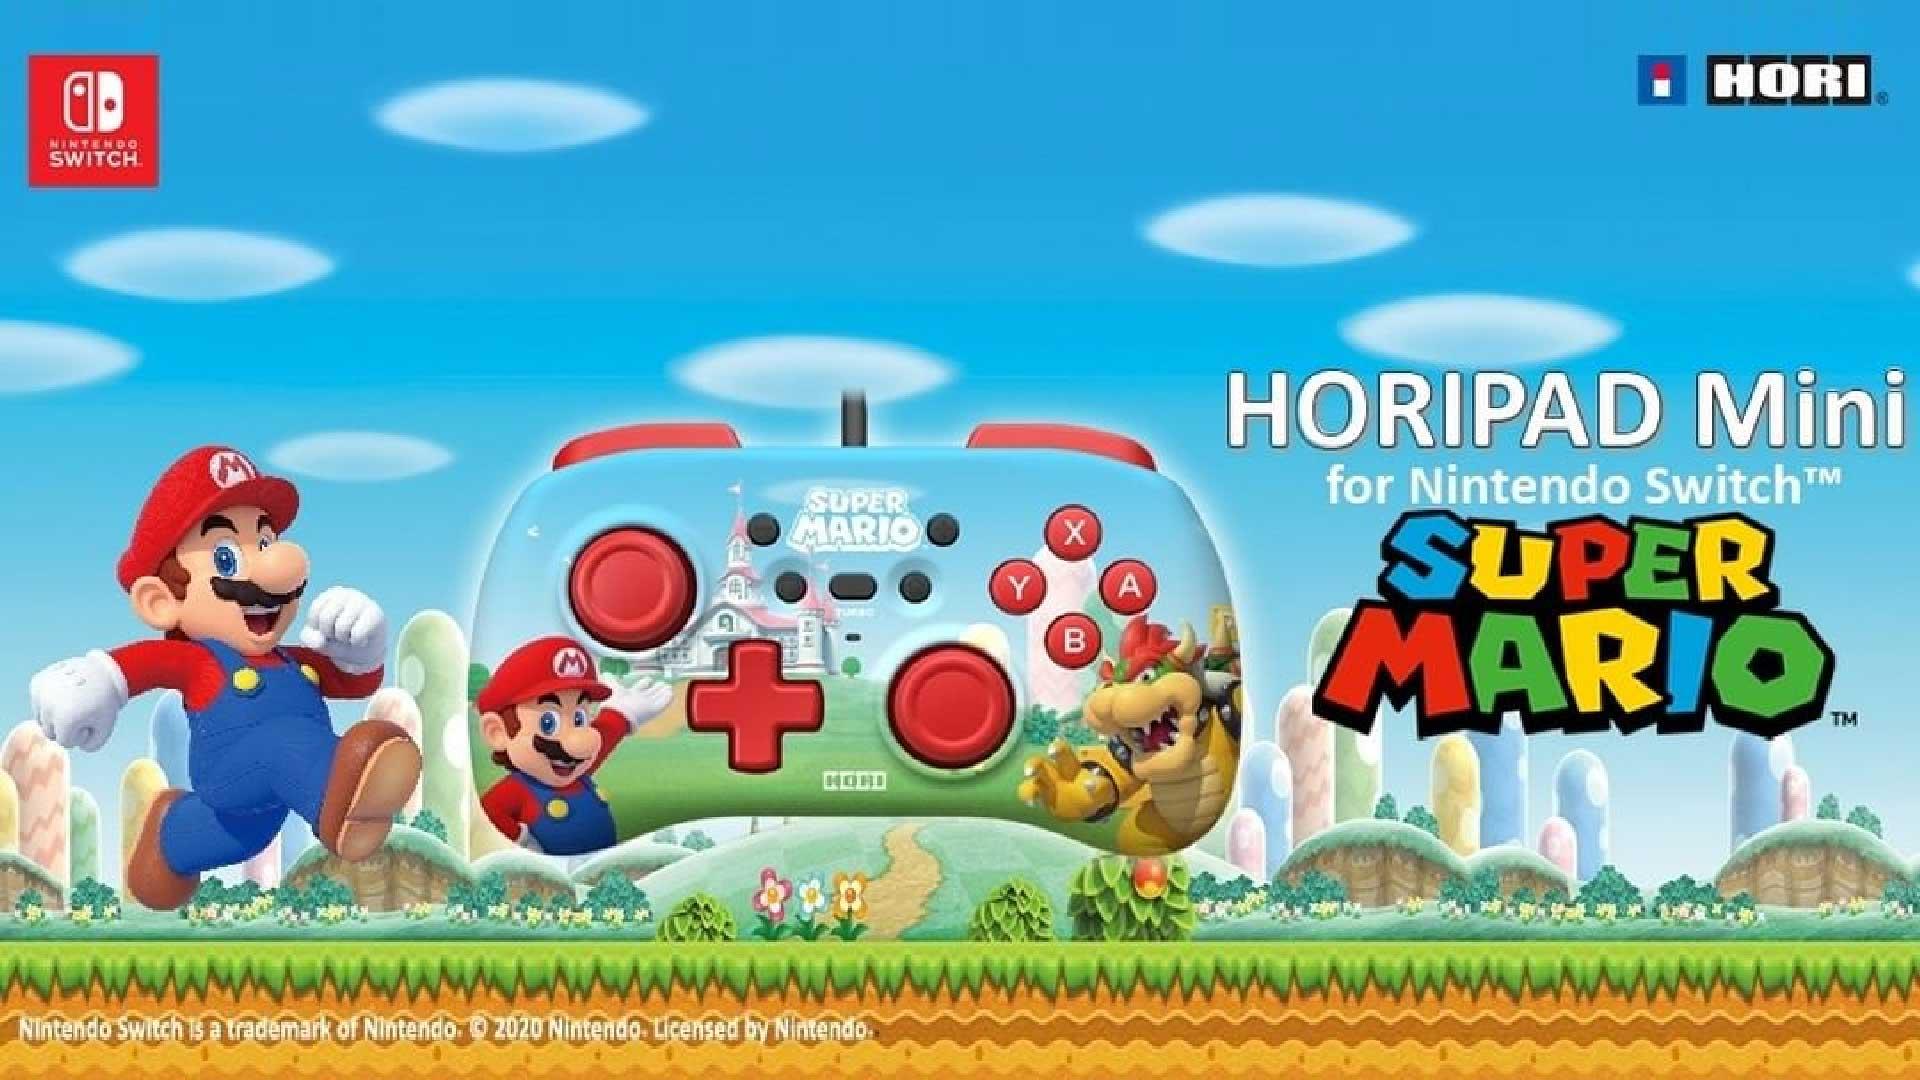 hori horipad mini switch teaser